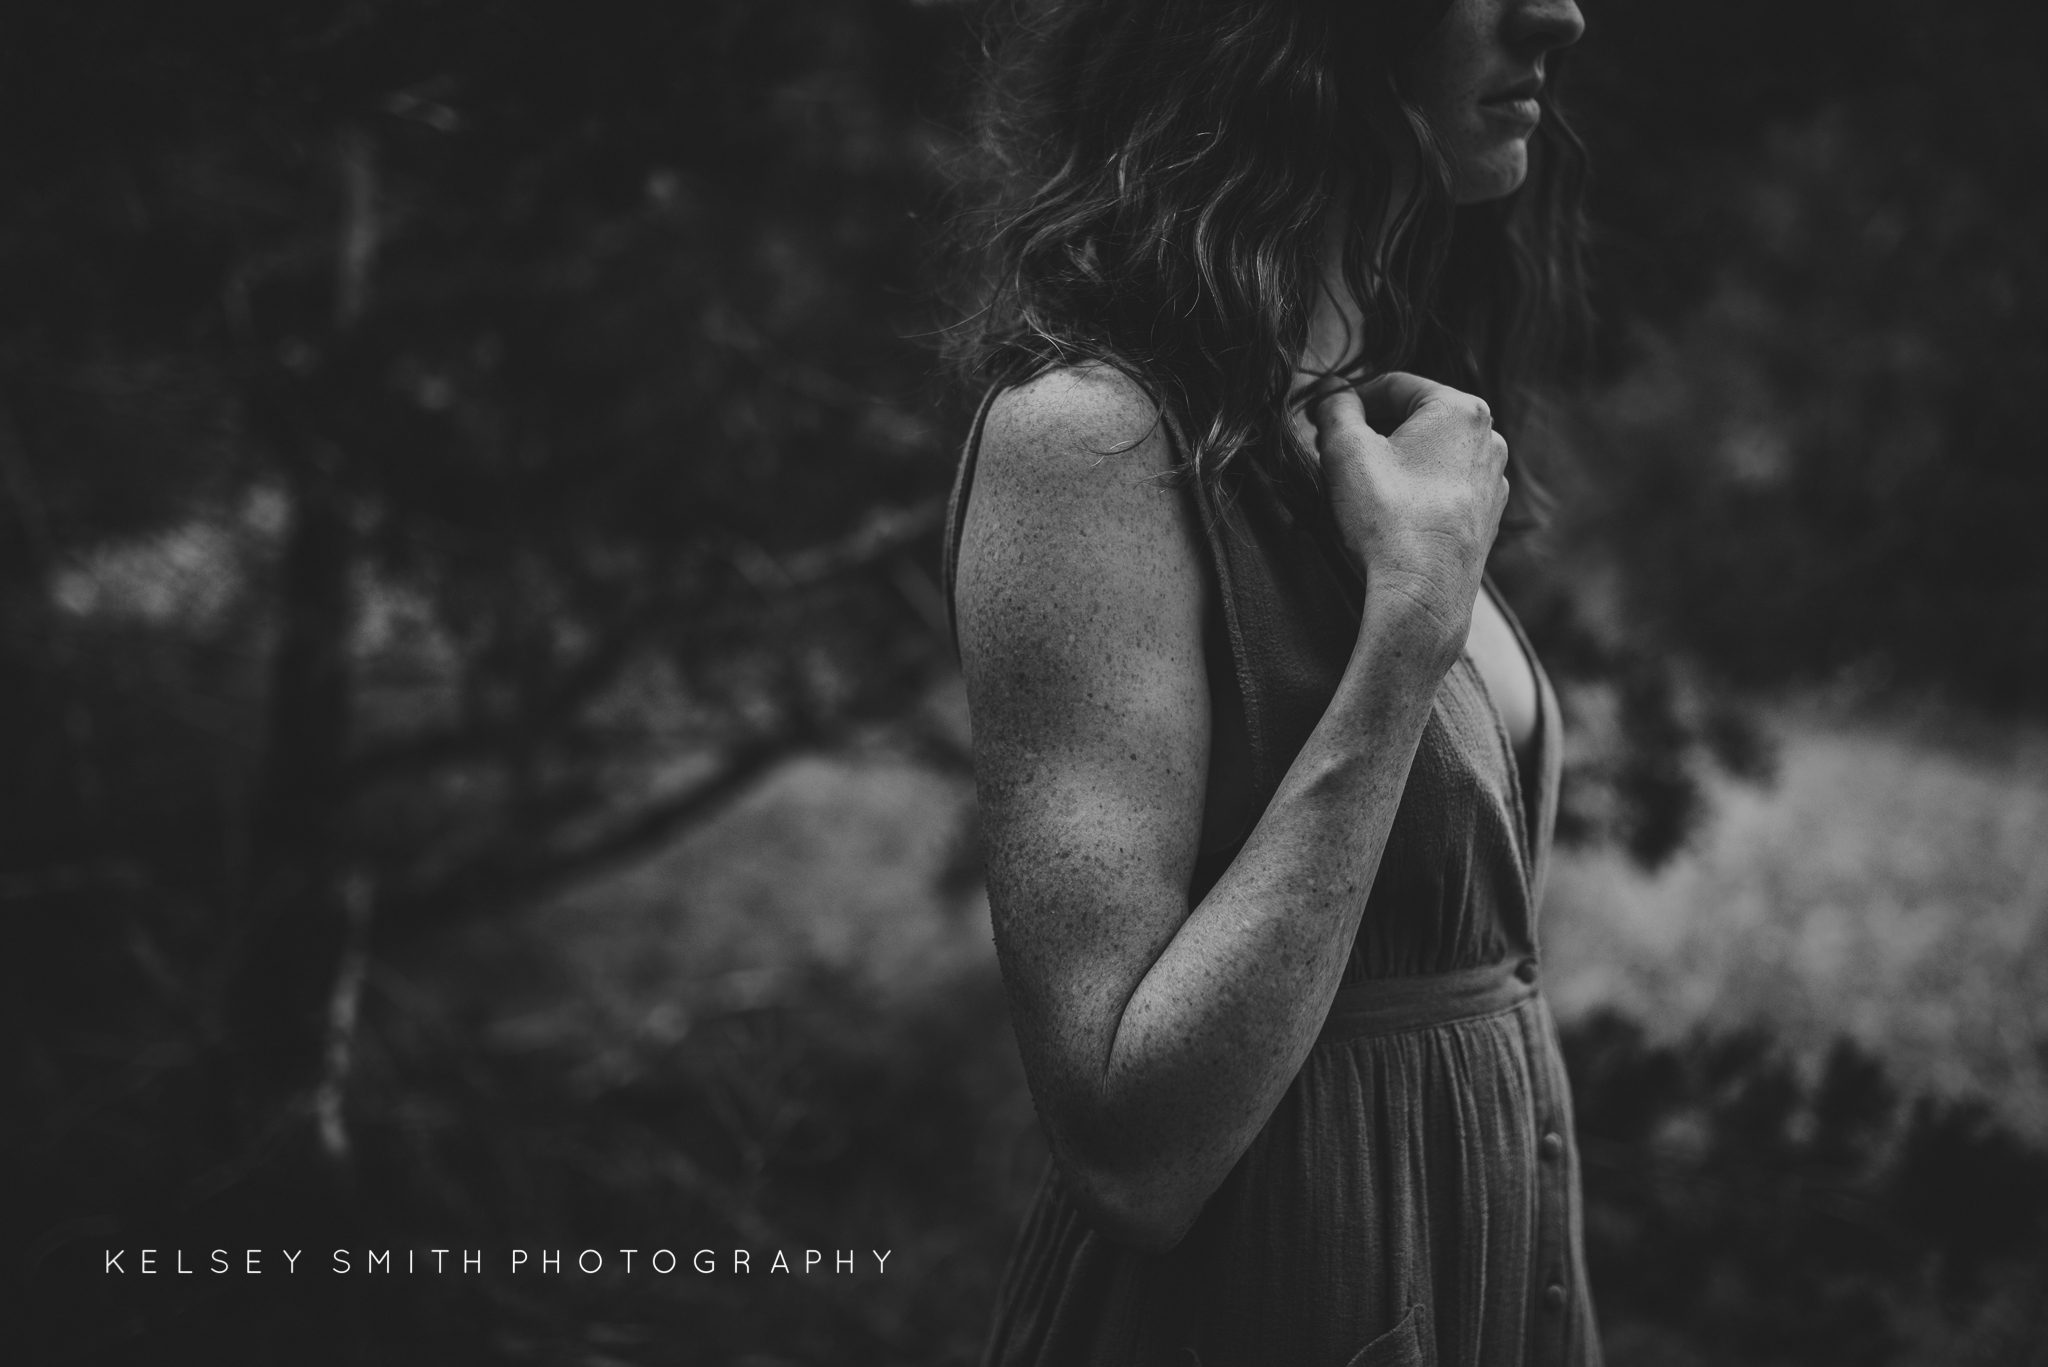 TheDeadTreeSociety_KelseySmithPhotography (Web Resolution)-2.jpg